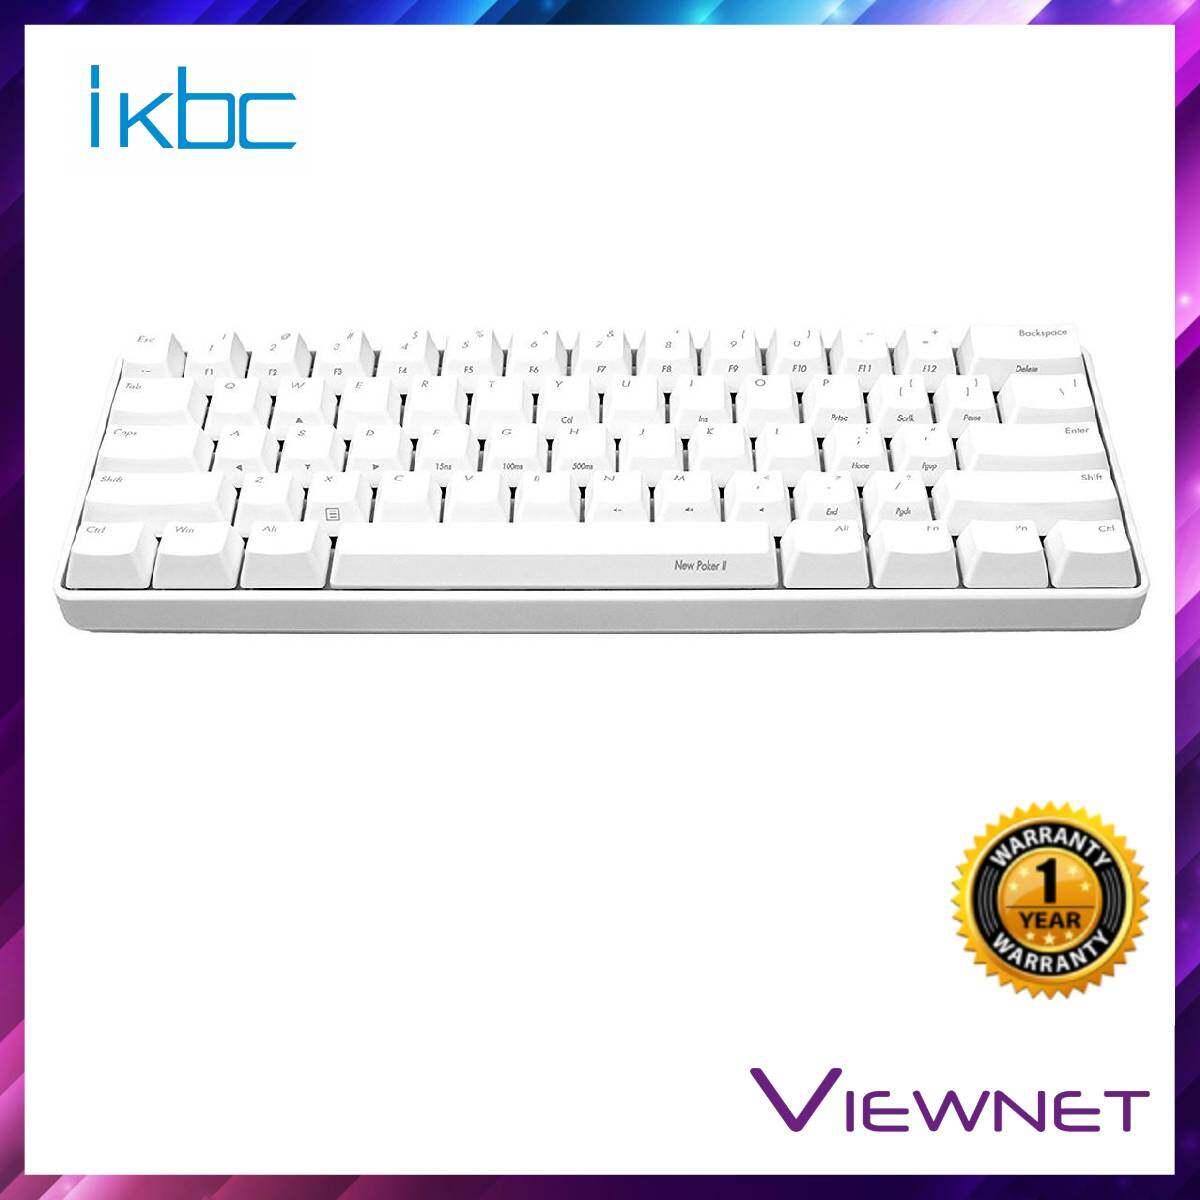 IKBC Gaming Wired New Poker II (Blue/Red Switch) White Keyboard